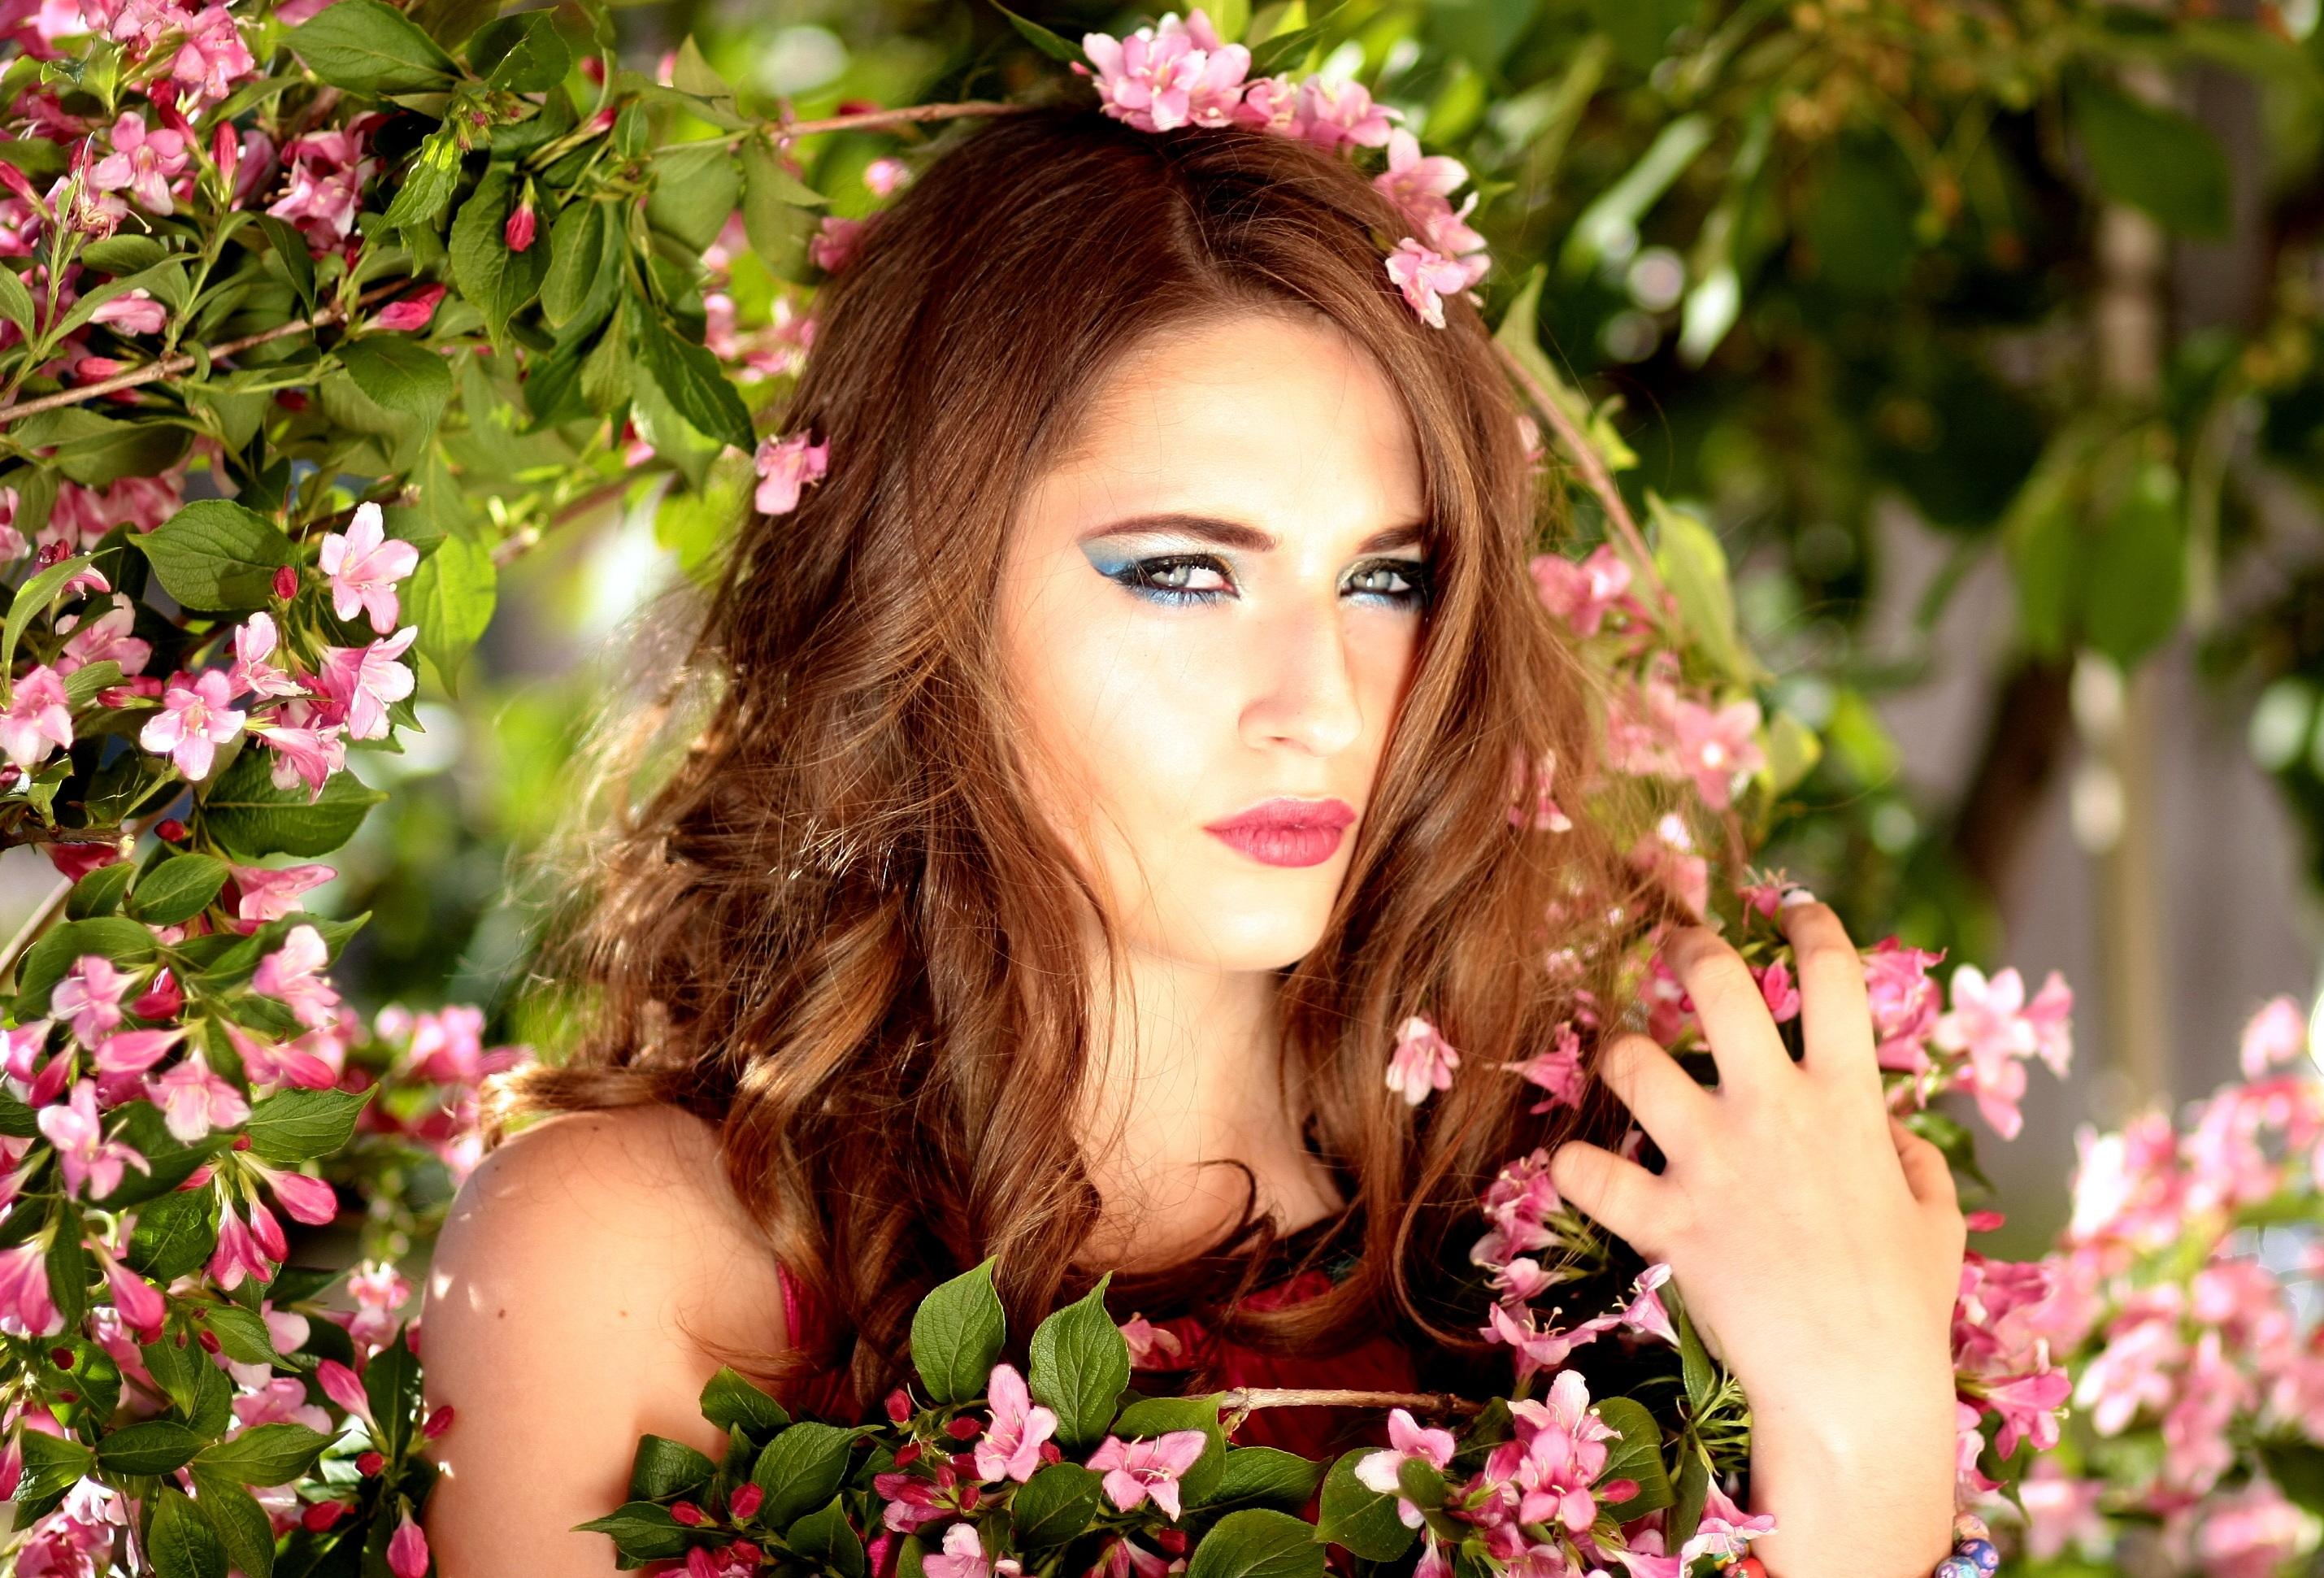 Фото картинки девушка в цветке